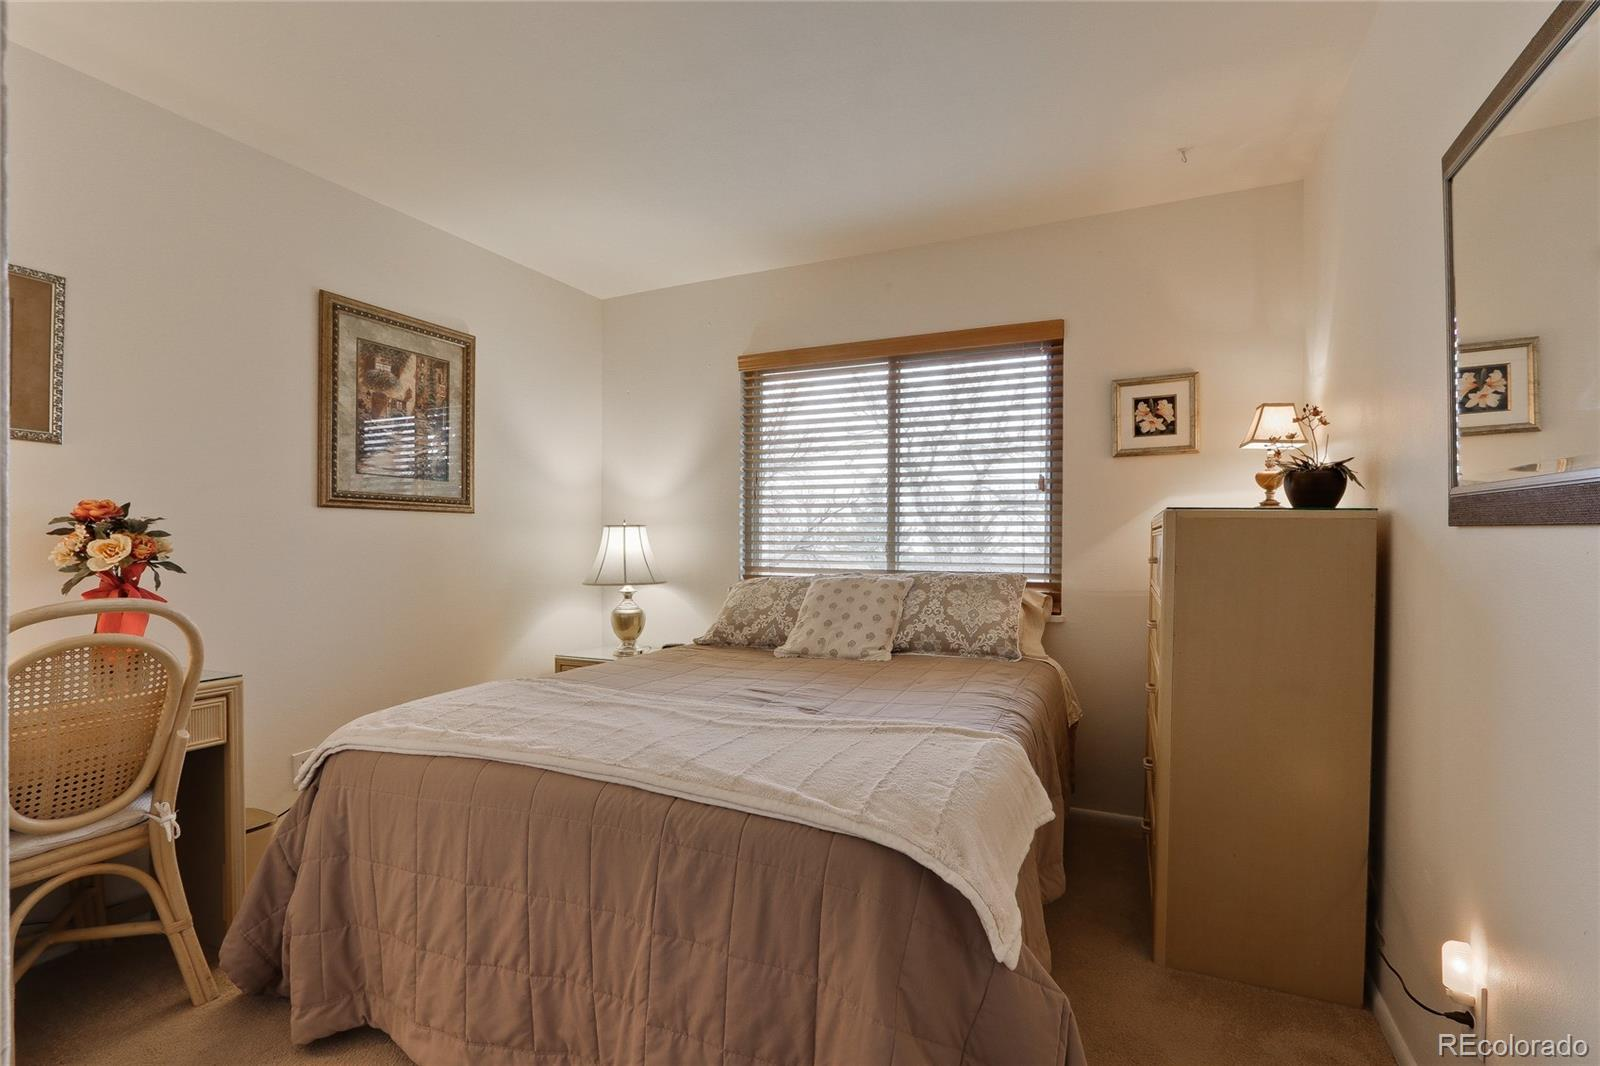 MLS# 6751608 - 18 - 12838 W Arizona Place, Lakewood, CO 80228